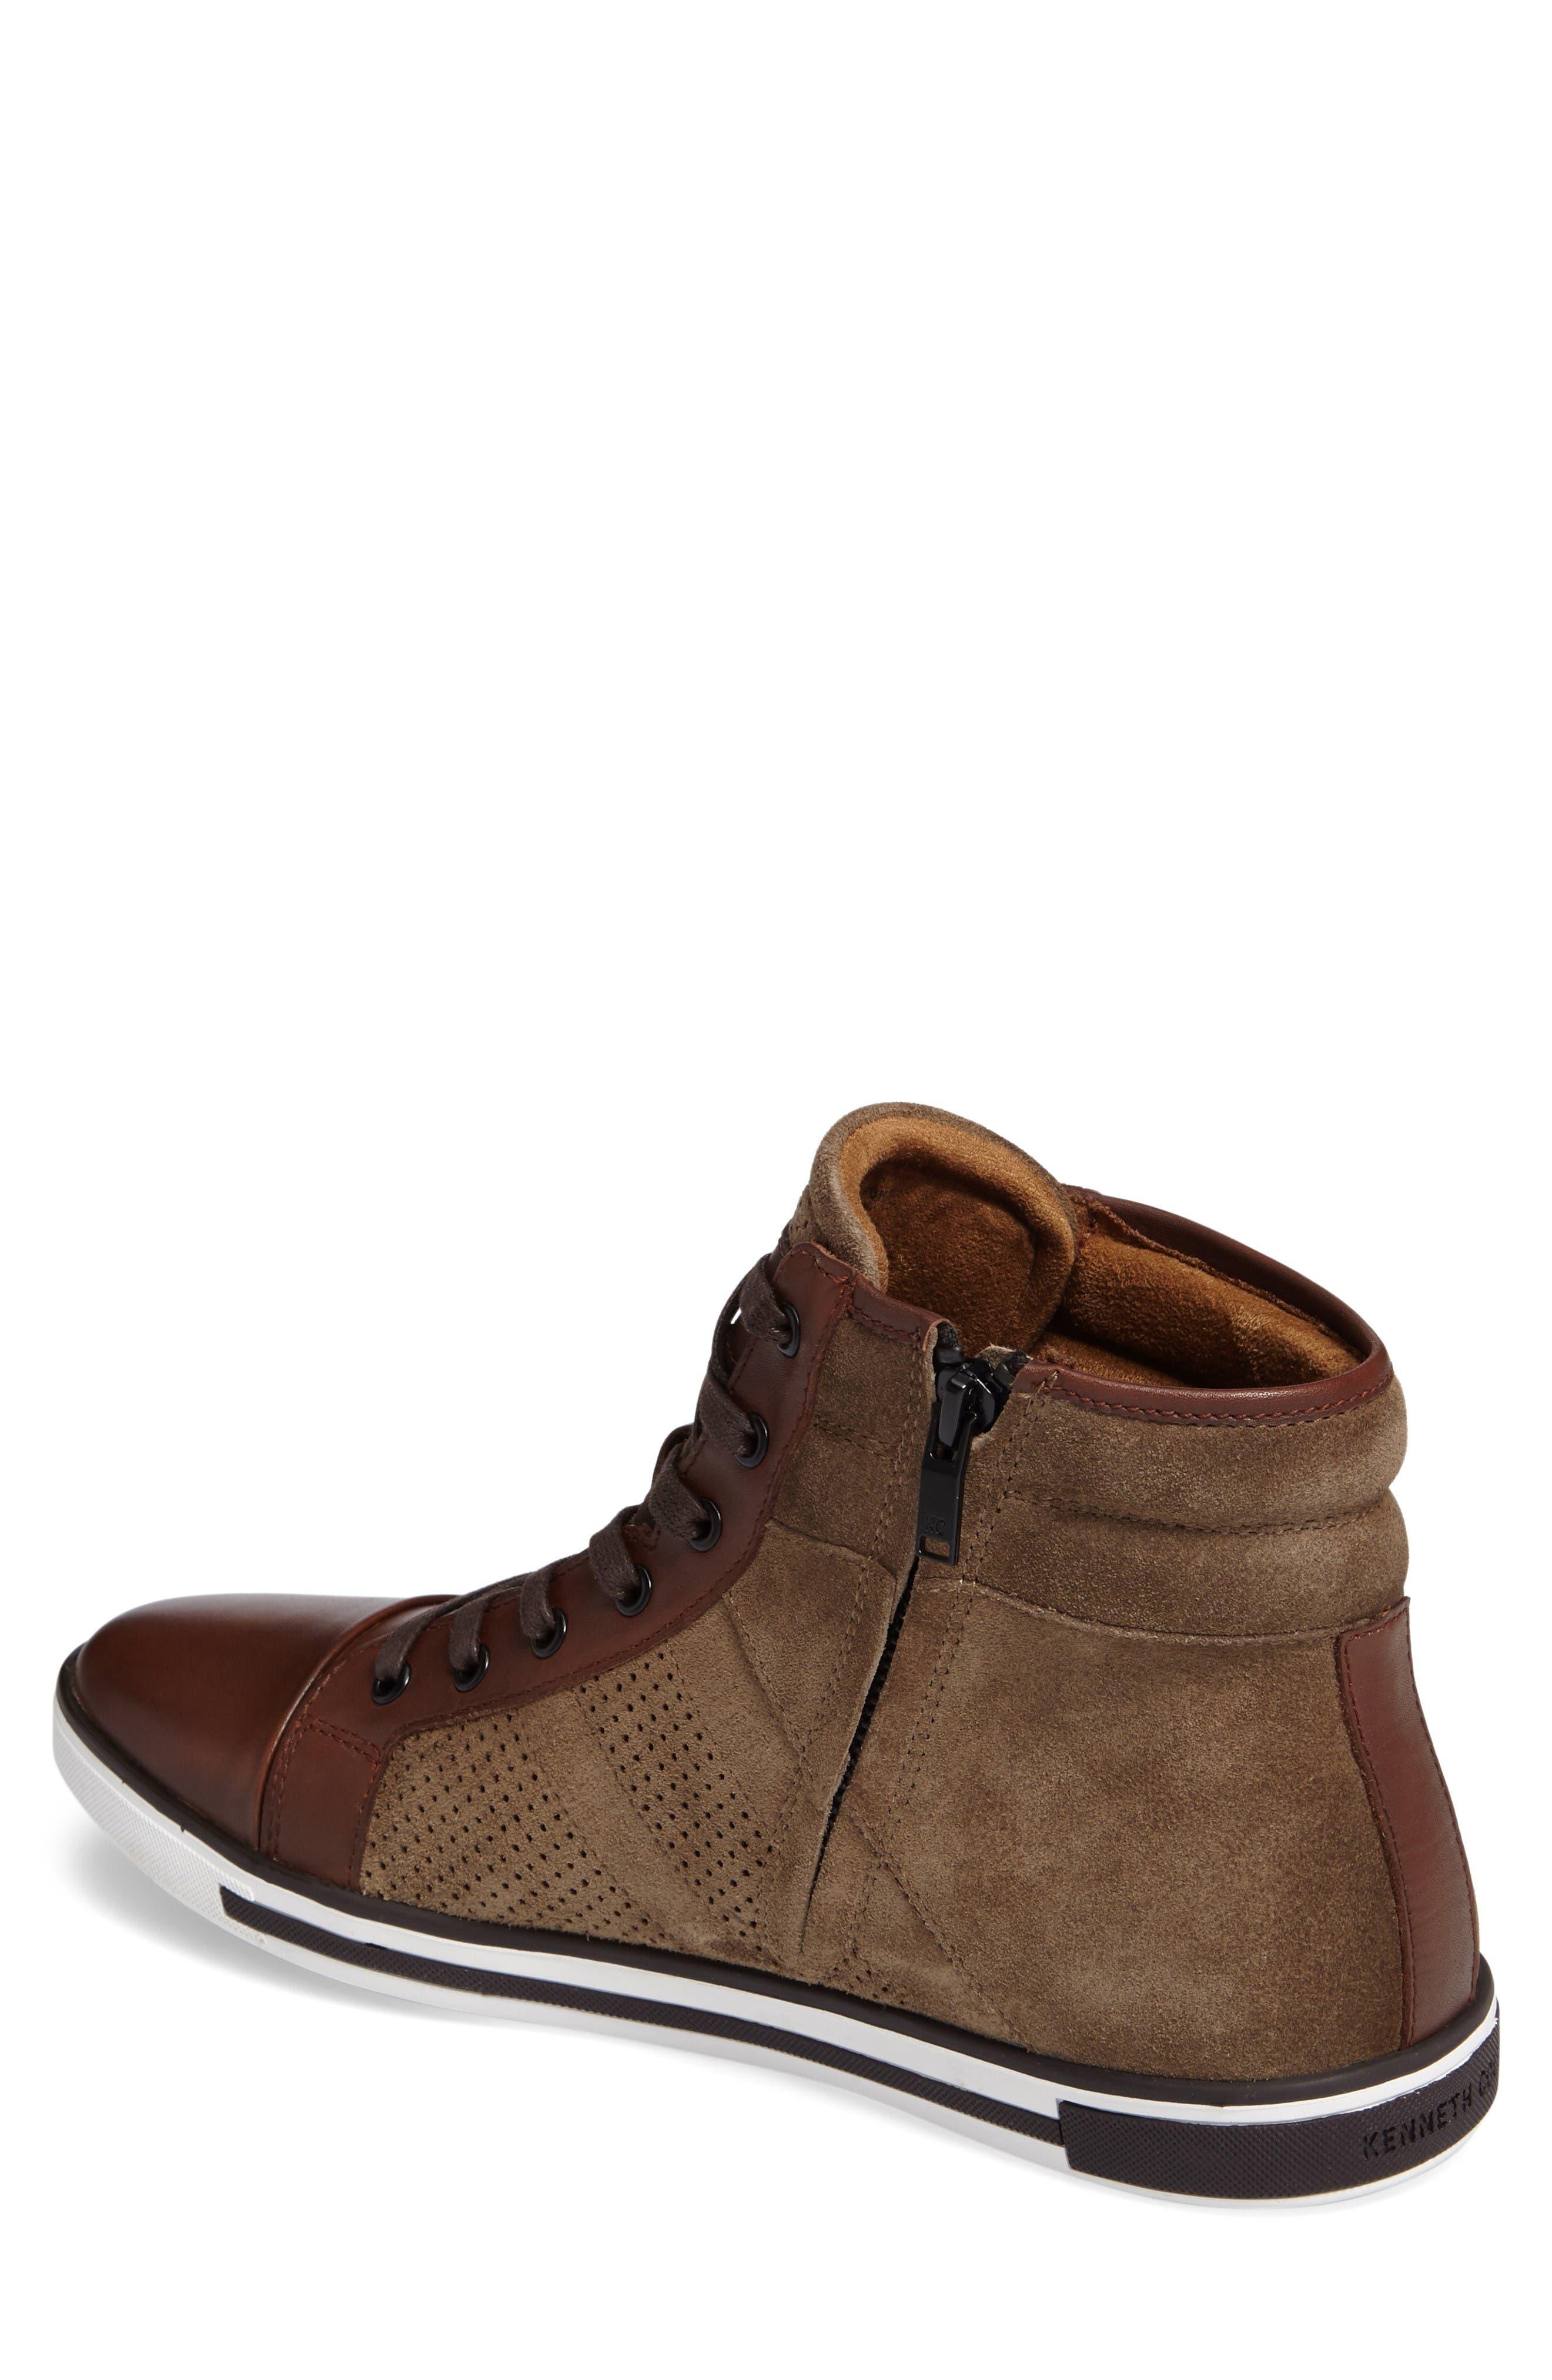 Alternate Image 2  - Kenneth Cole New York Initial Point Sneaker (Men)